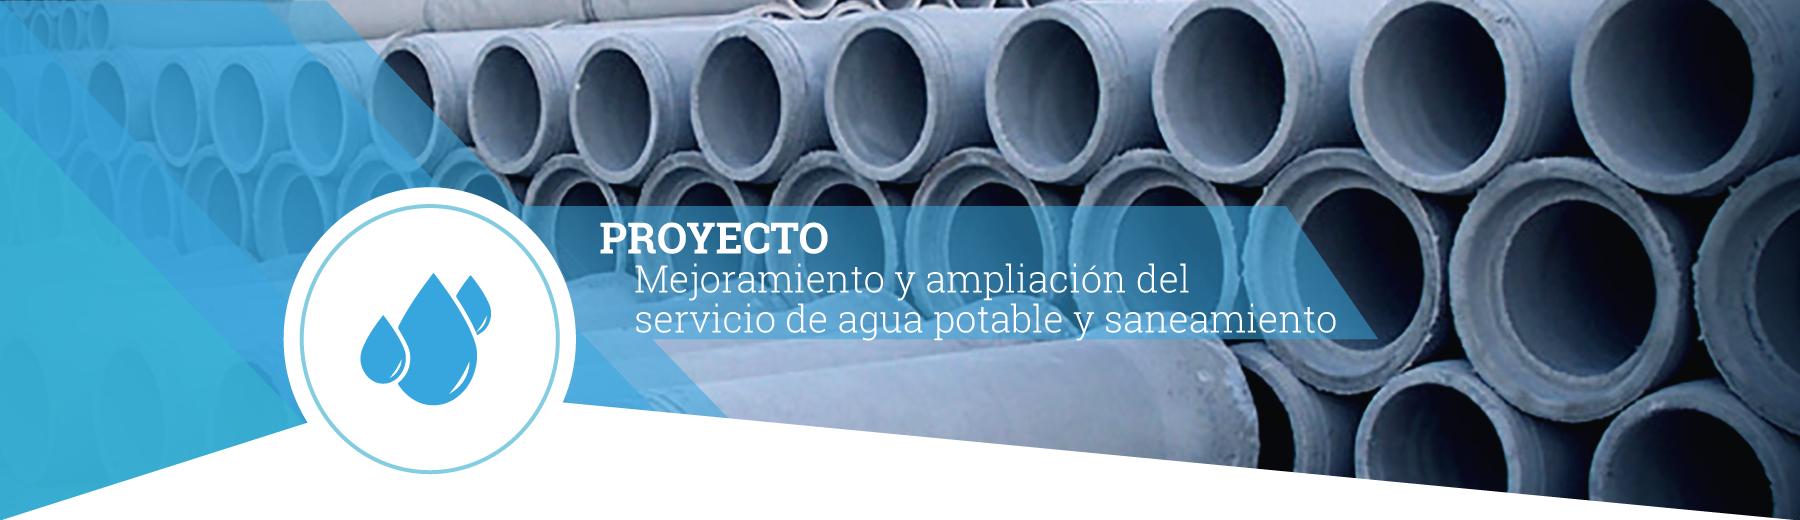 proyecto2-2